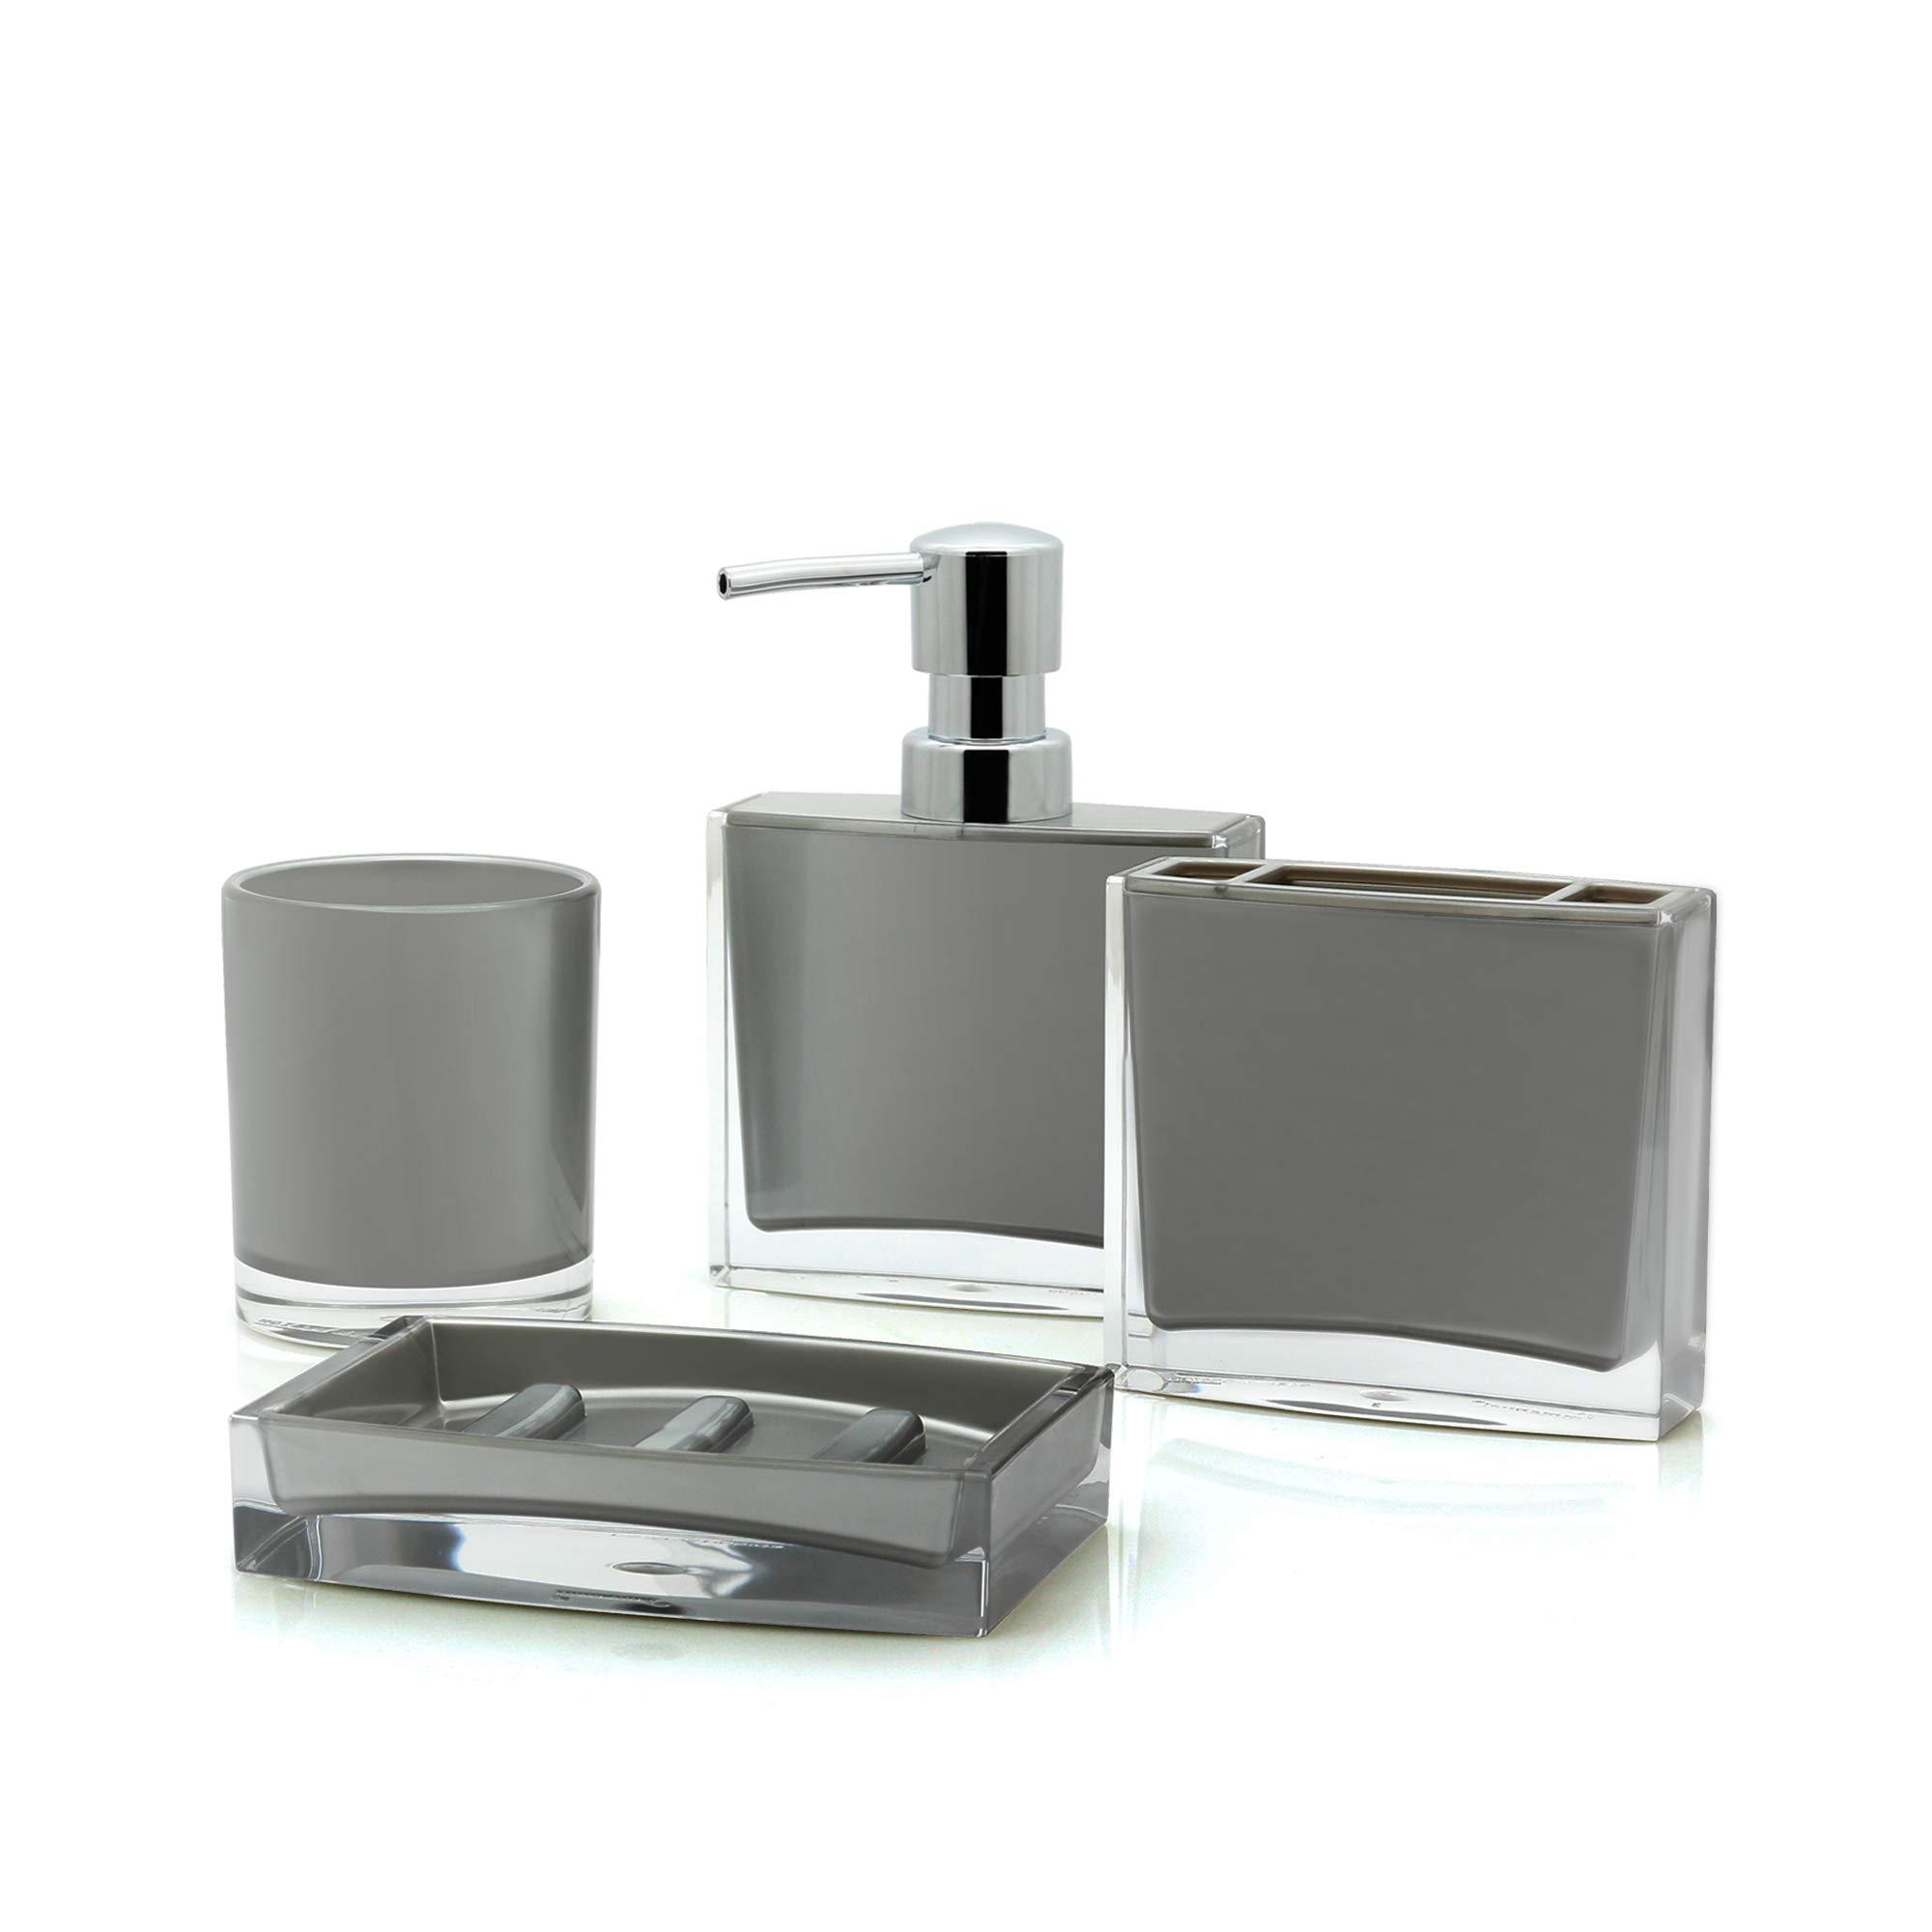 IMMANUEL Iced 4 Piece Bathroom Accessory Set - Gray